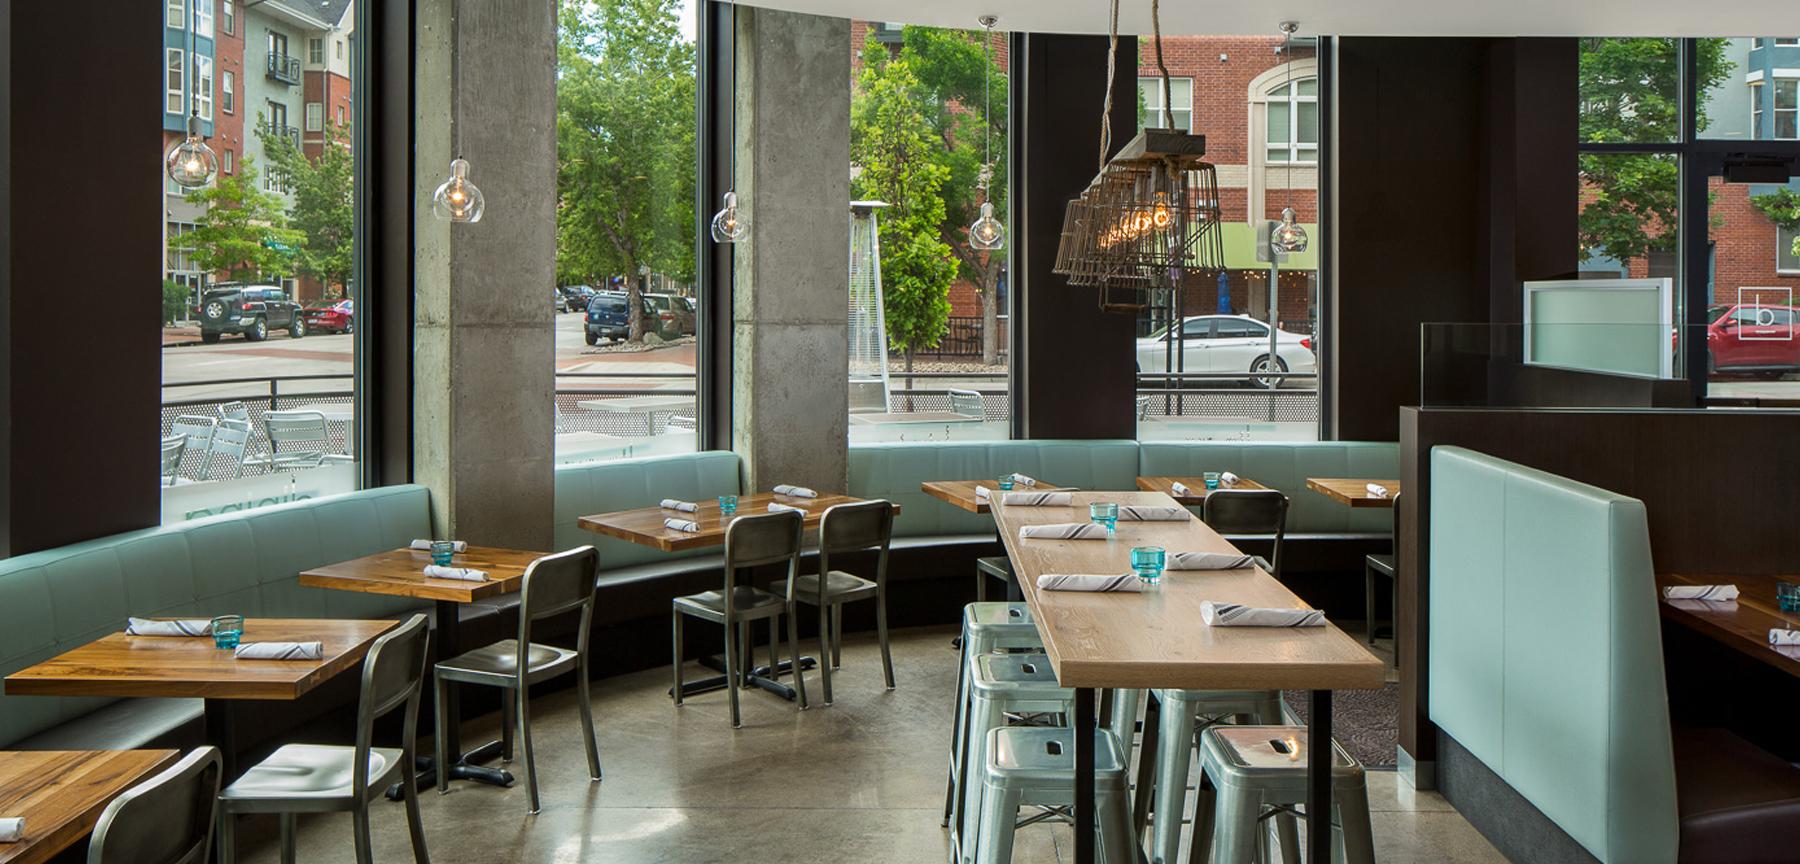 D Bar Denver dining area